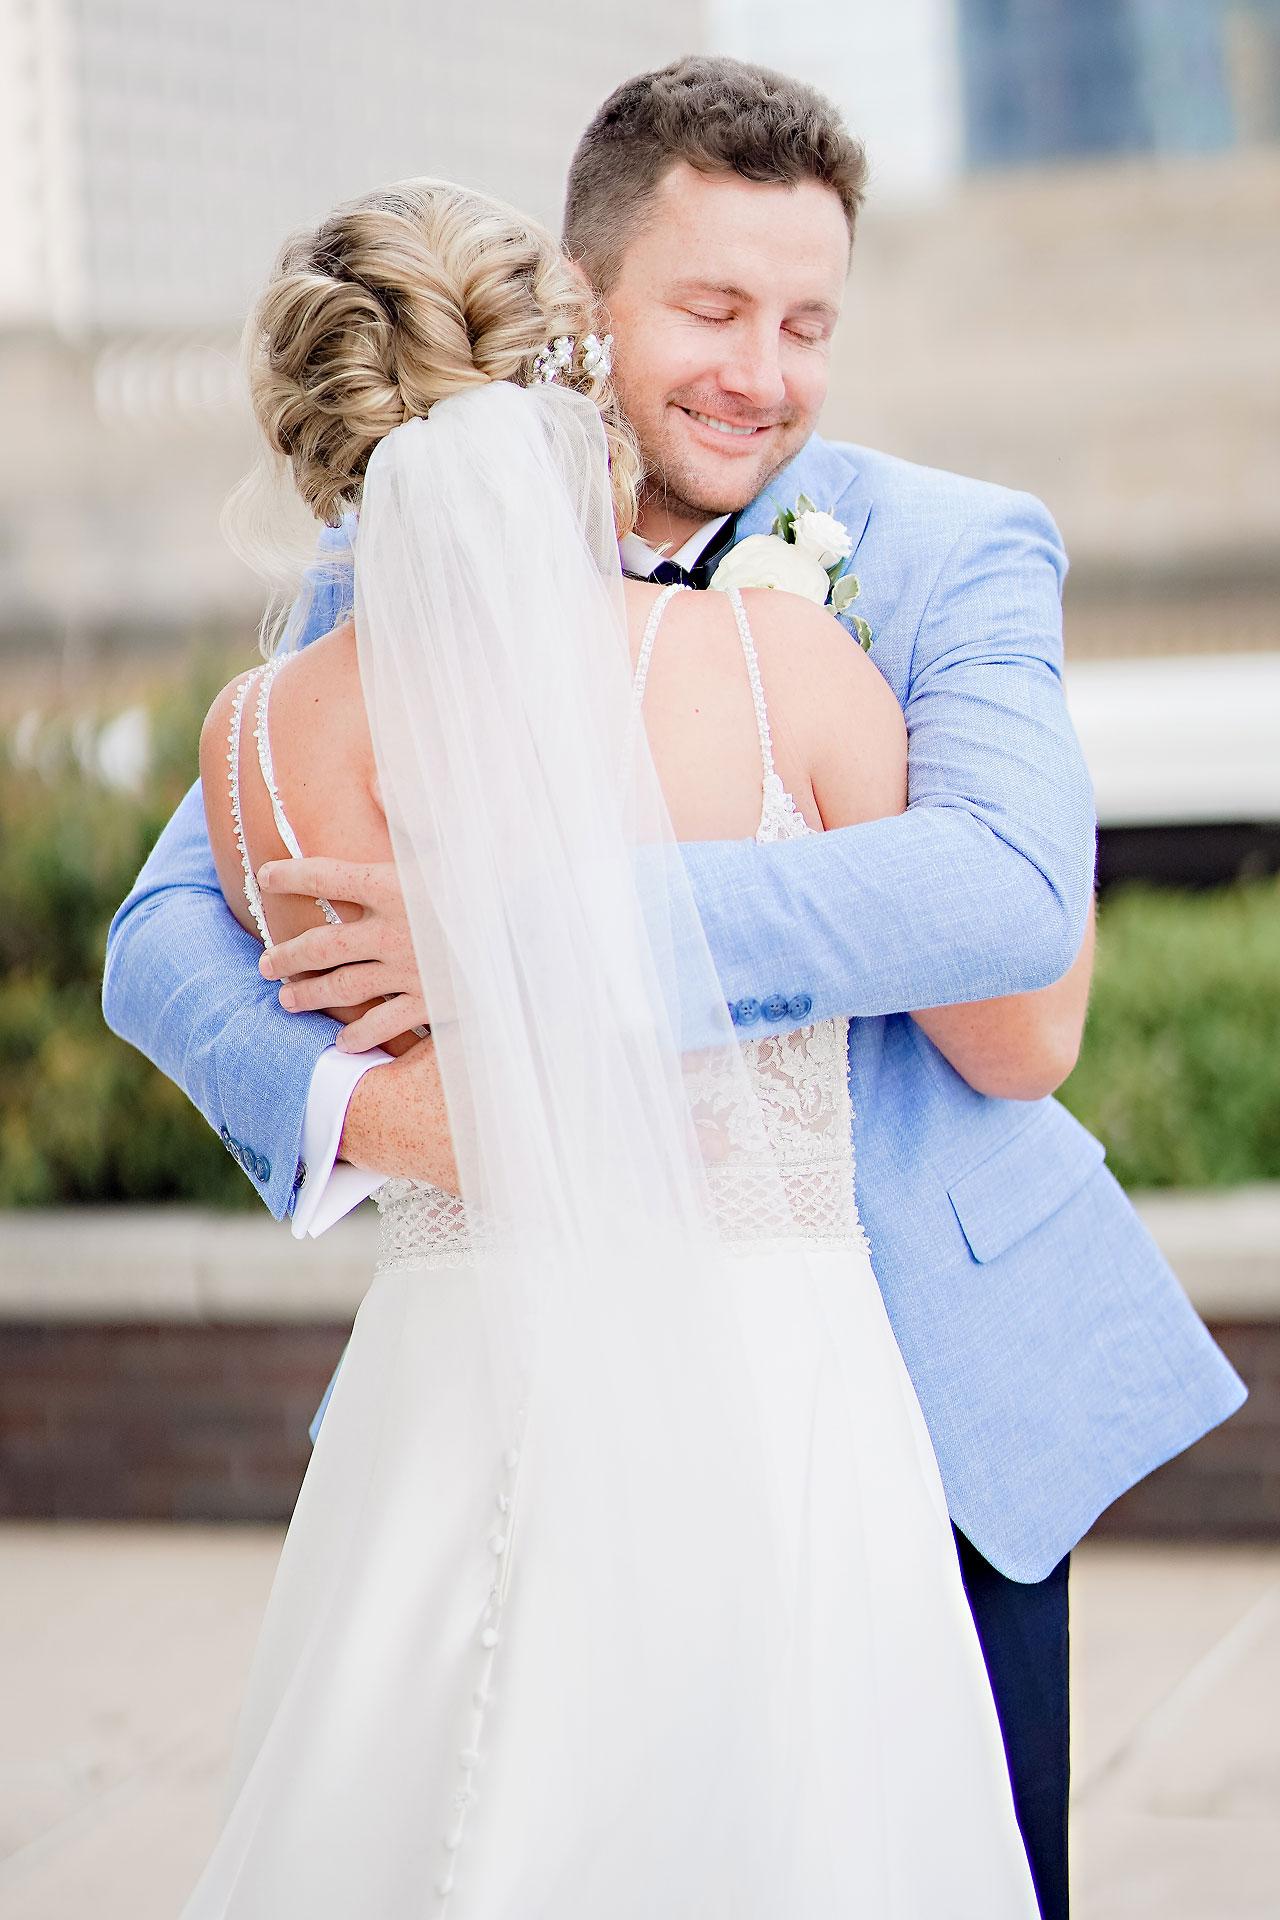 Sammi Jack Regions Tower JPS Events Indianapolis Wedding 053